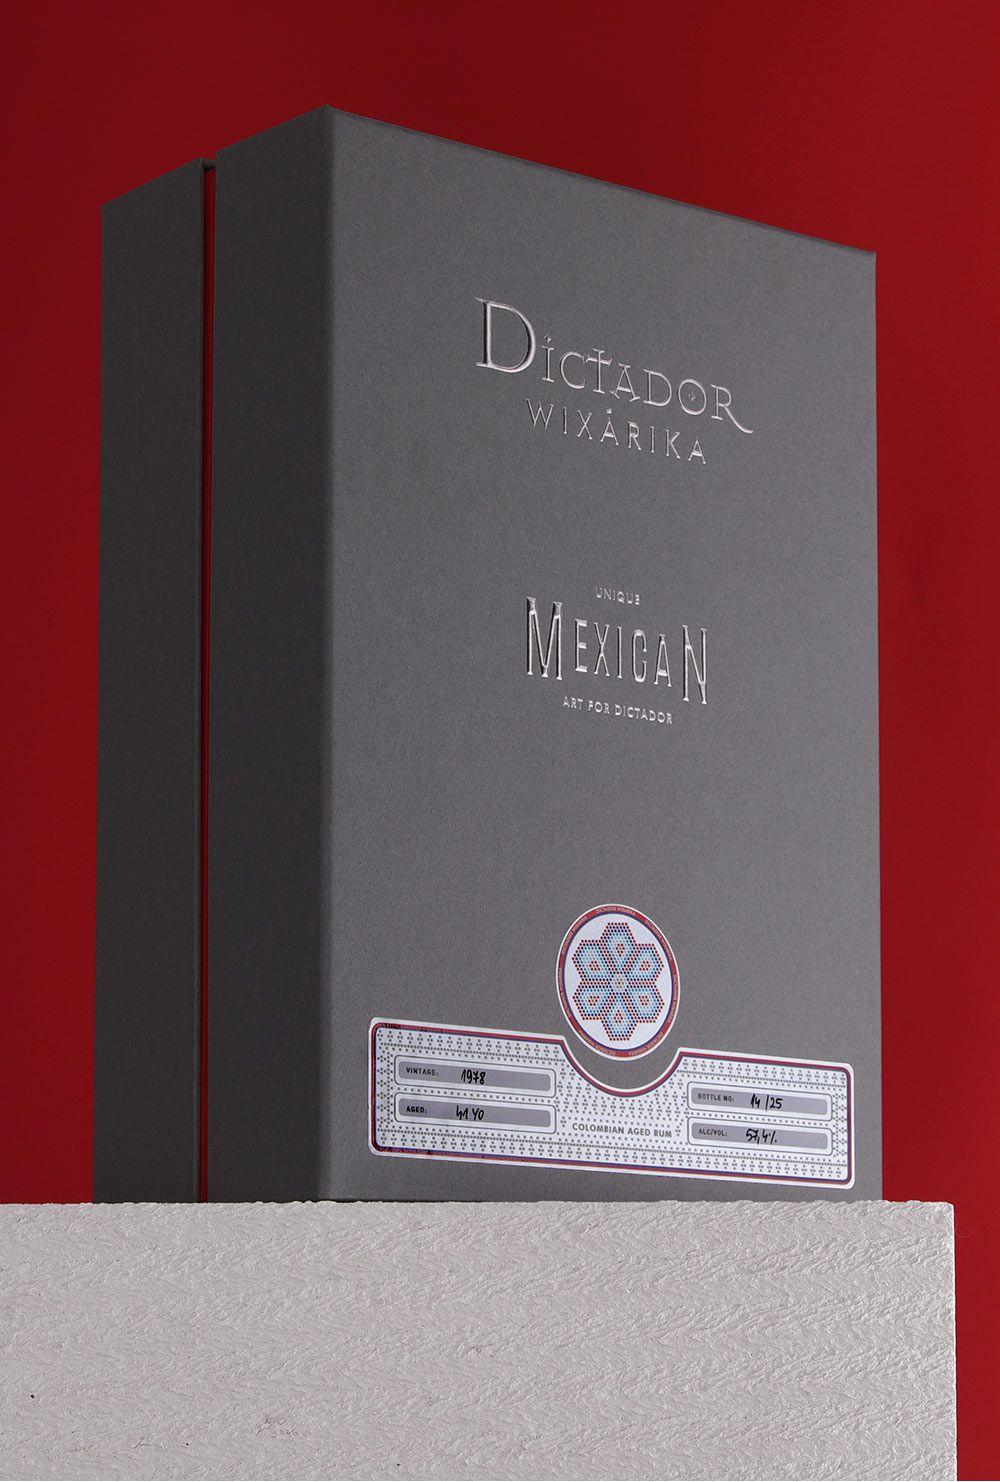 Dictador Wixarika - Model 2018/2